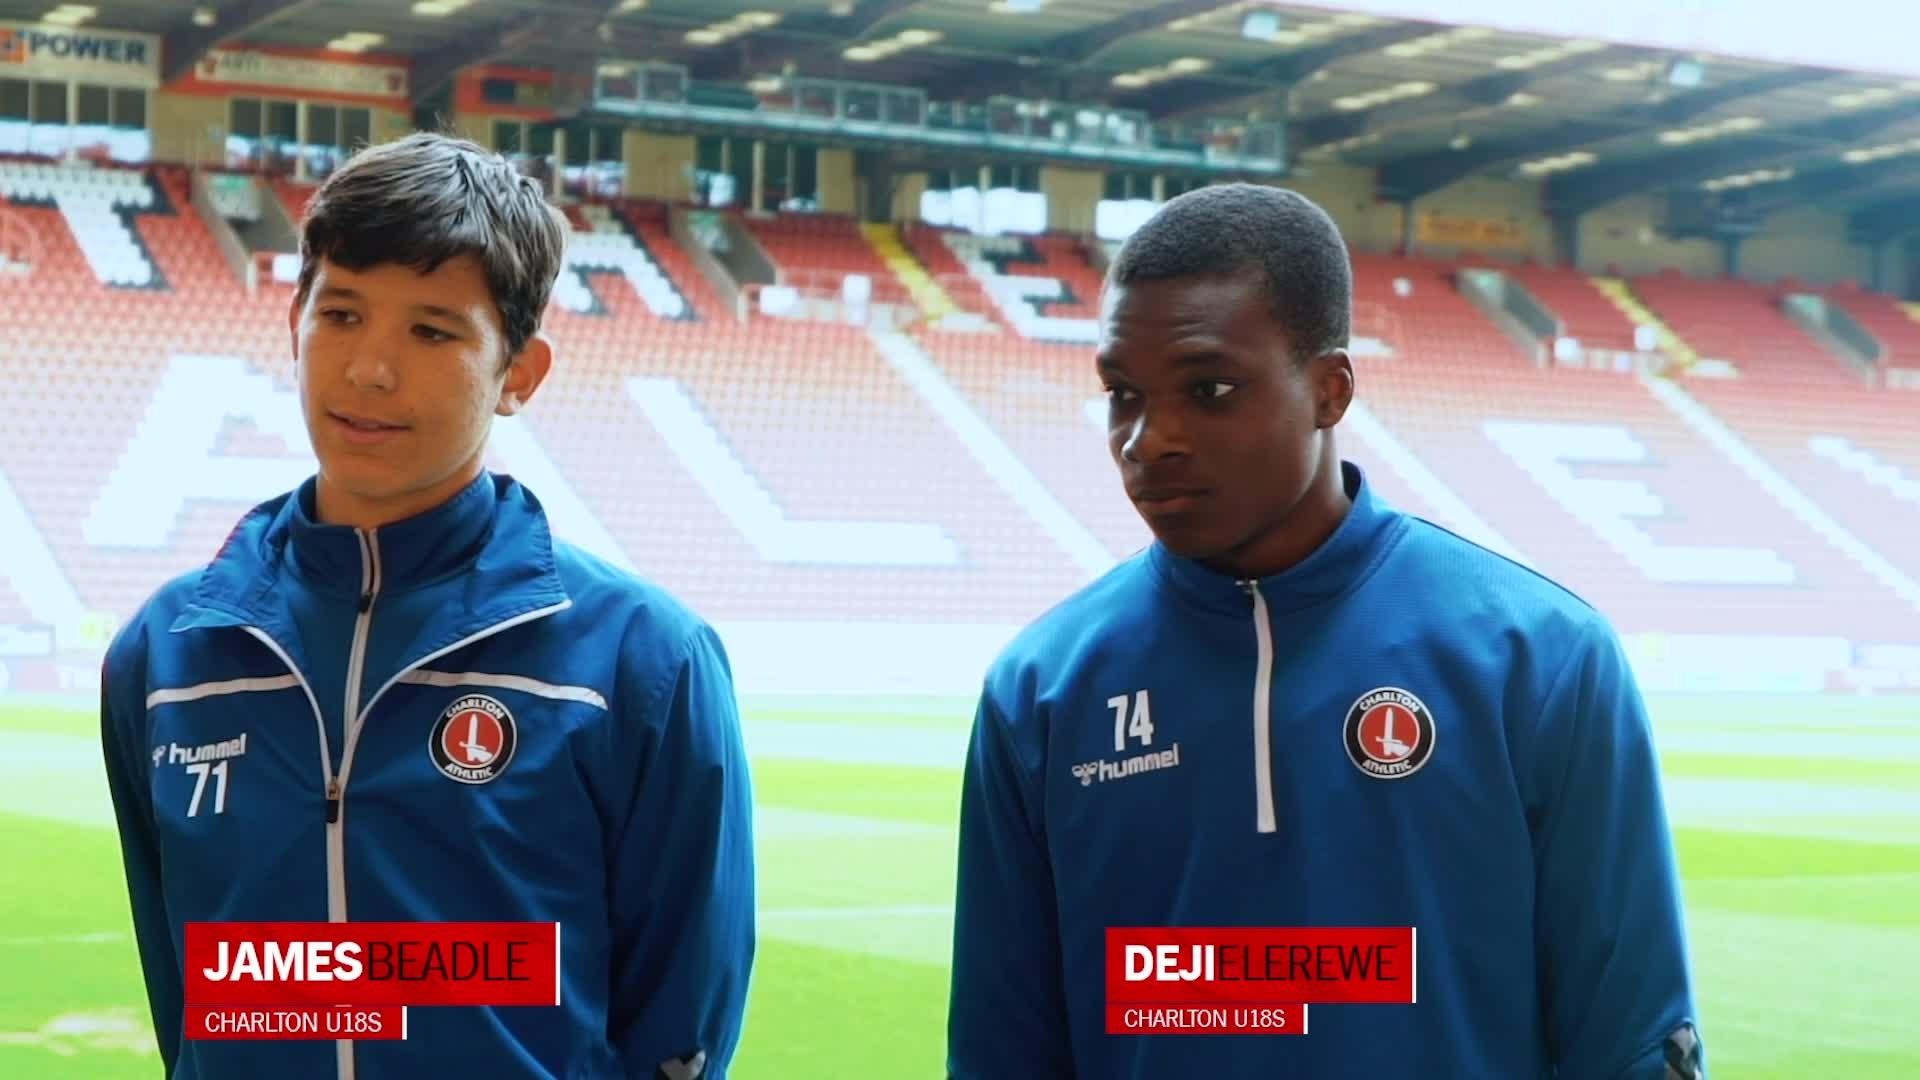 James Beadle and Deji Elerewe on Charlton U18s' play-off semi-final (May 2021)